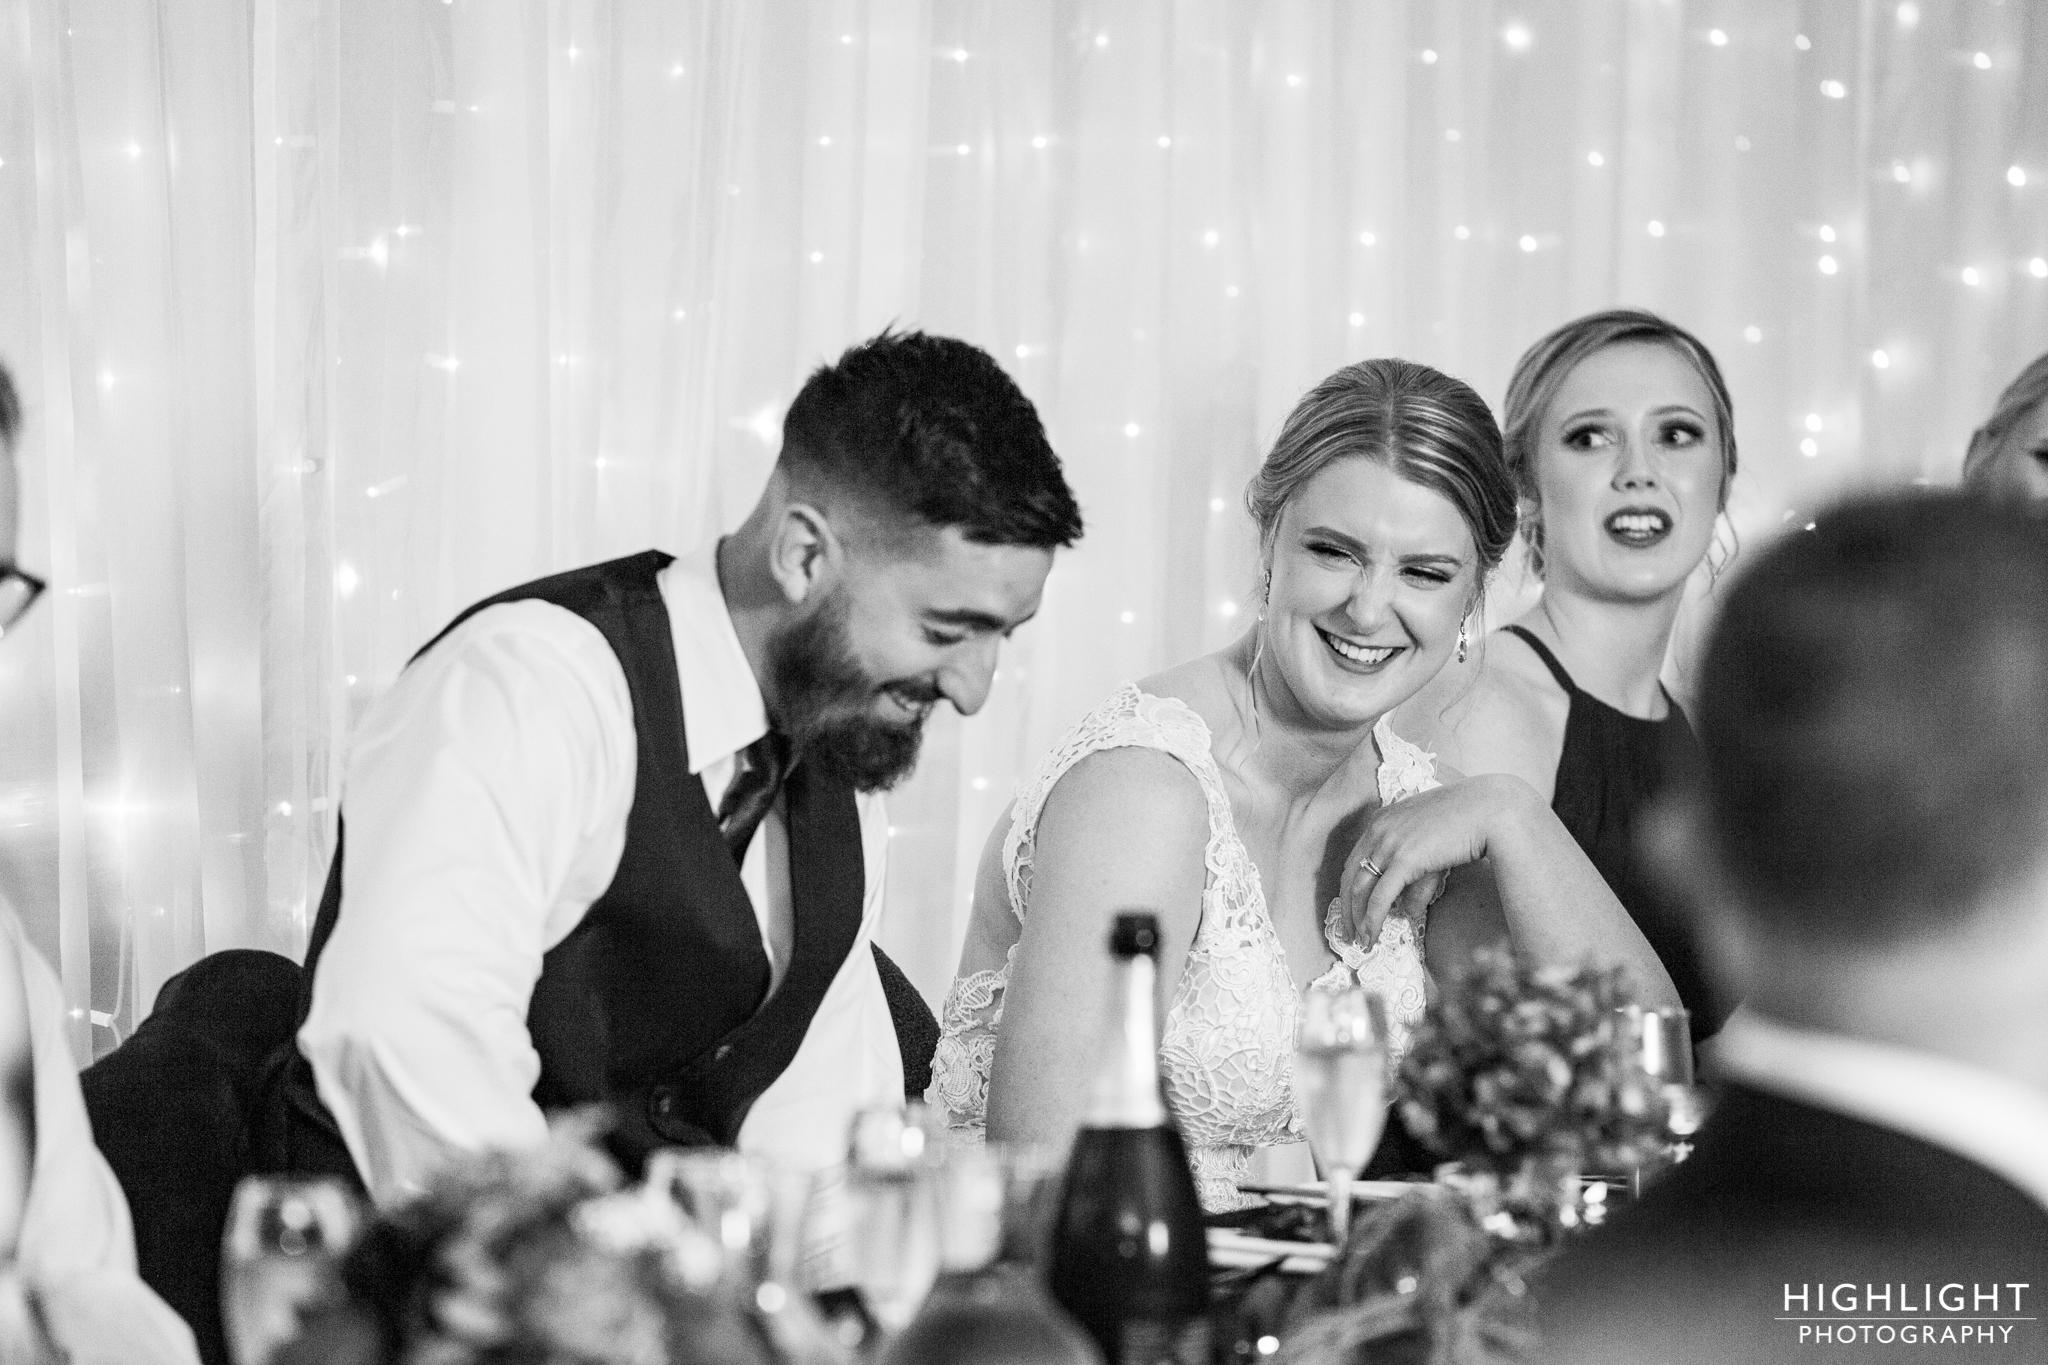 bw-highlight-wedding-photography-feilding-new-zealand-3.jpg